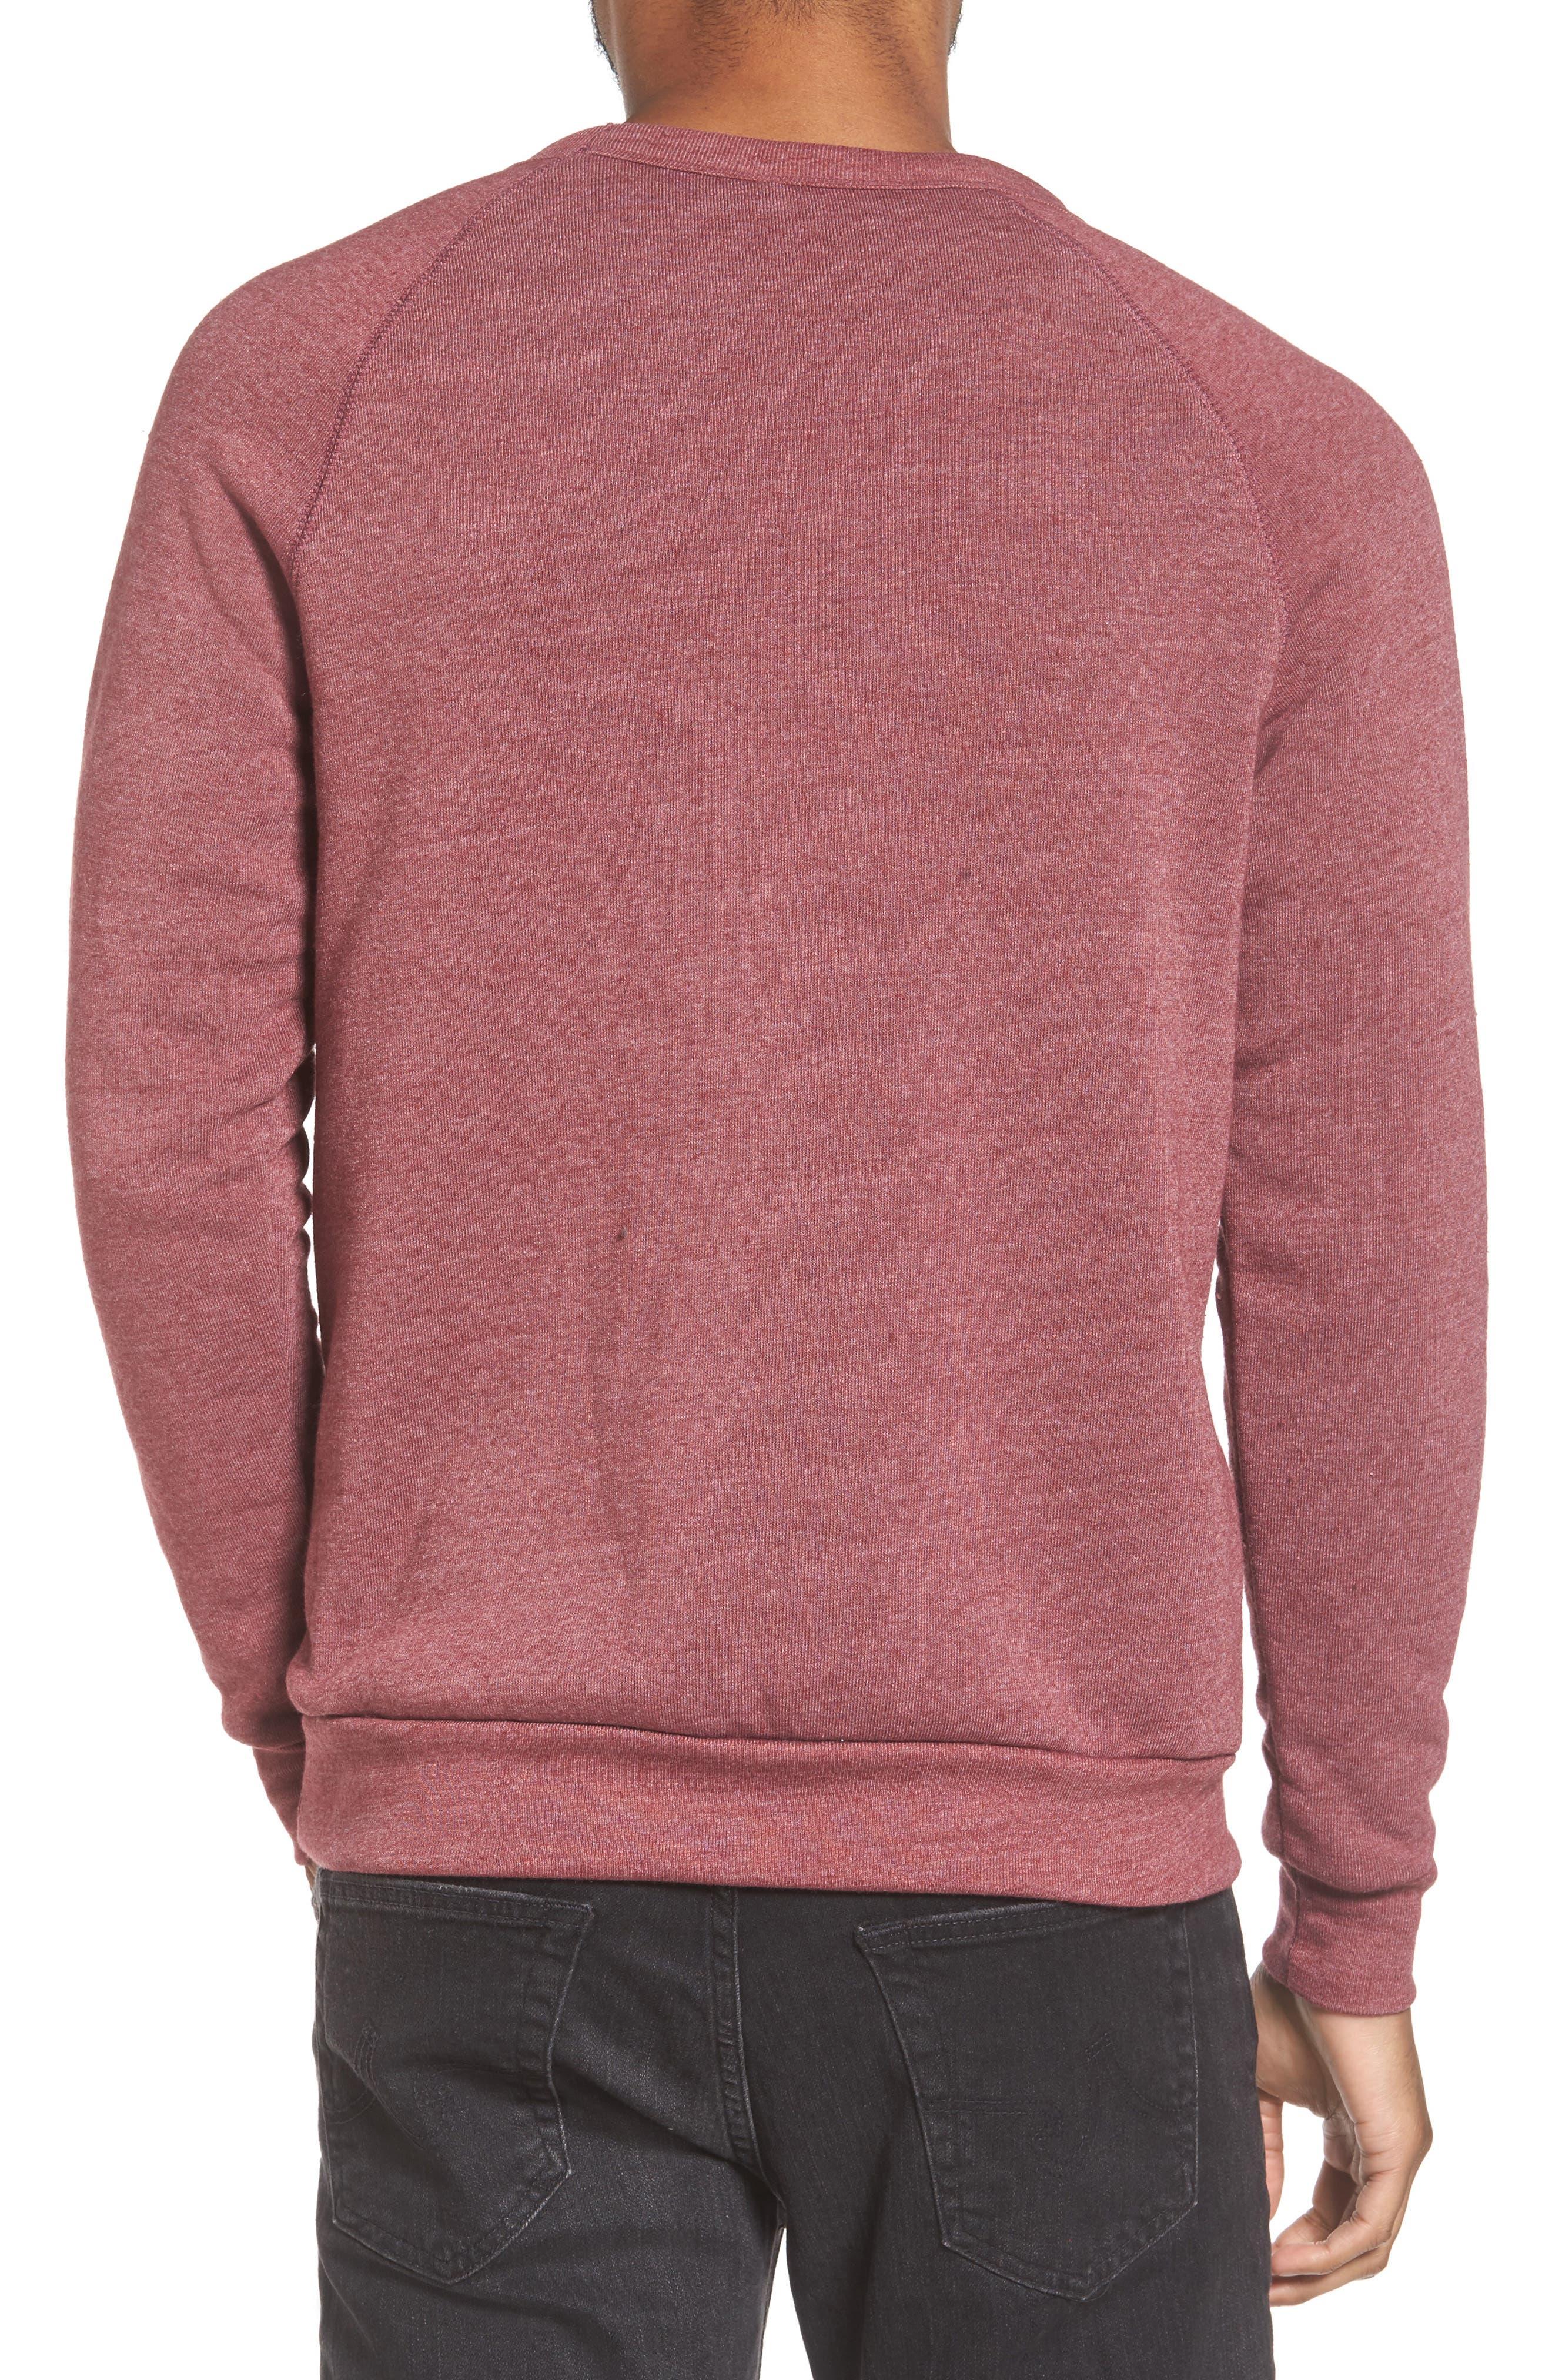 'The Champ' Sweatshirt,                             Alternate thumbnail 22, color,